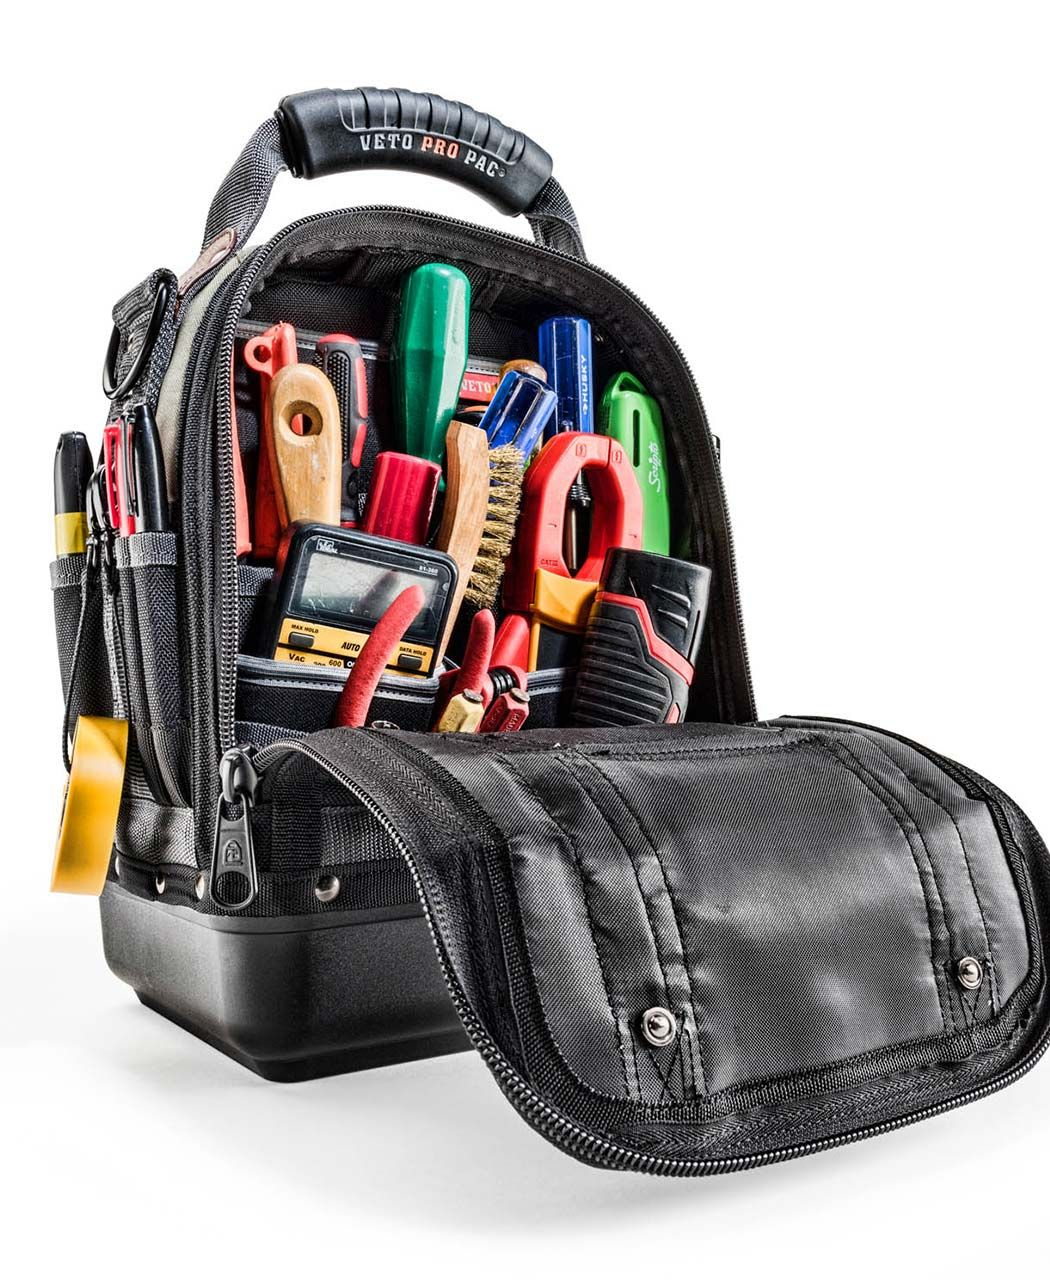 Tech Mct Compact Tall Tool Bag Vetopropac Tool Bag Bags Heavy Duty